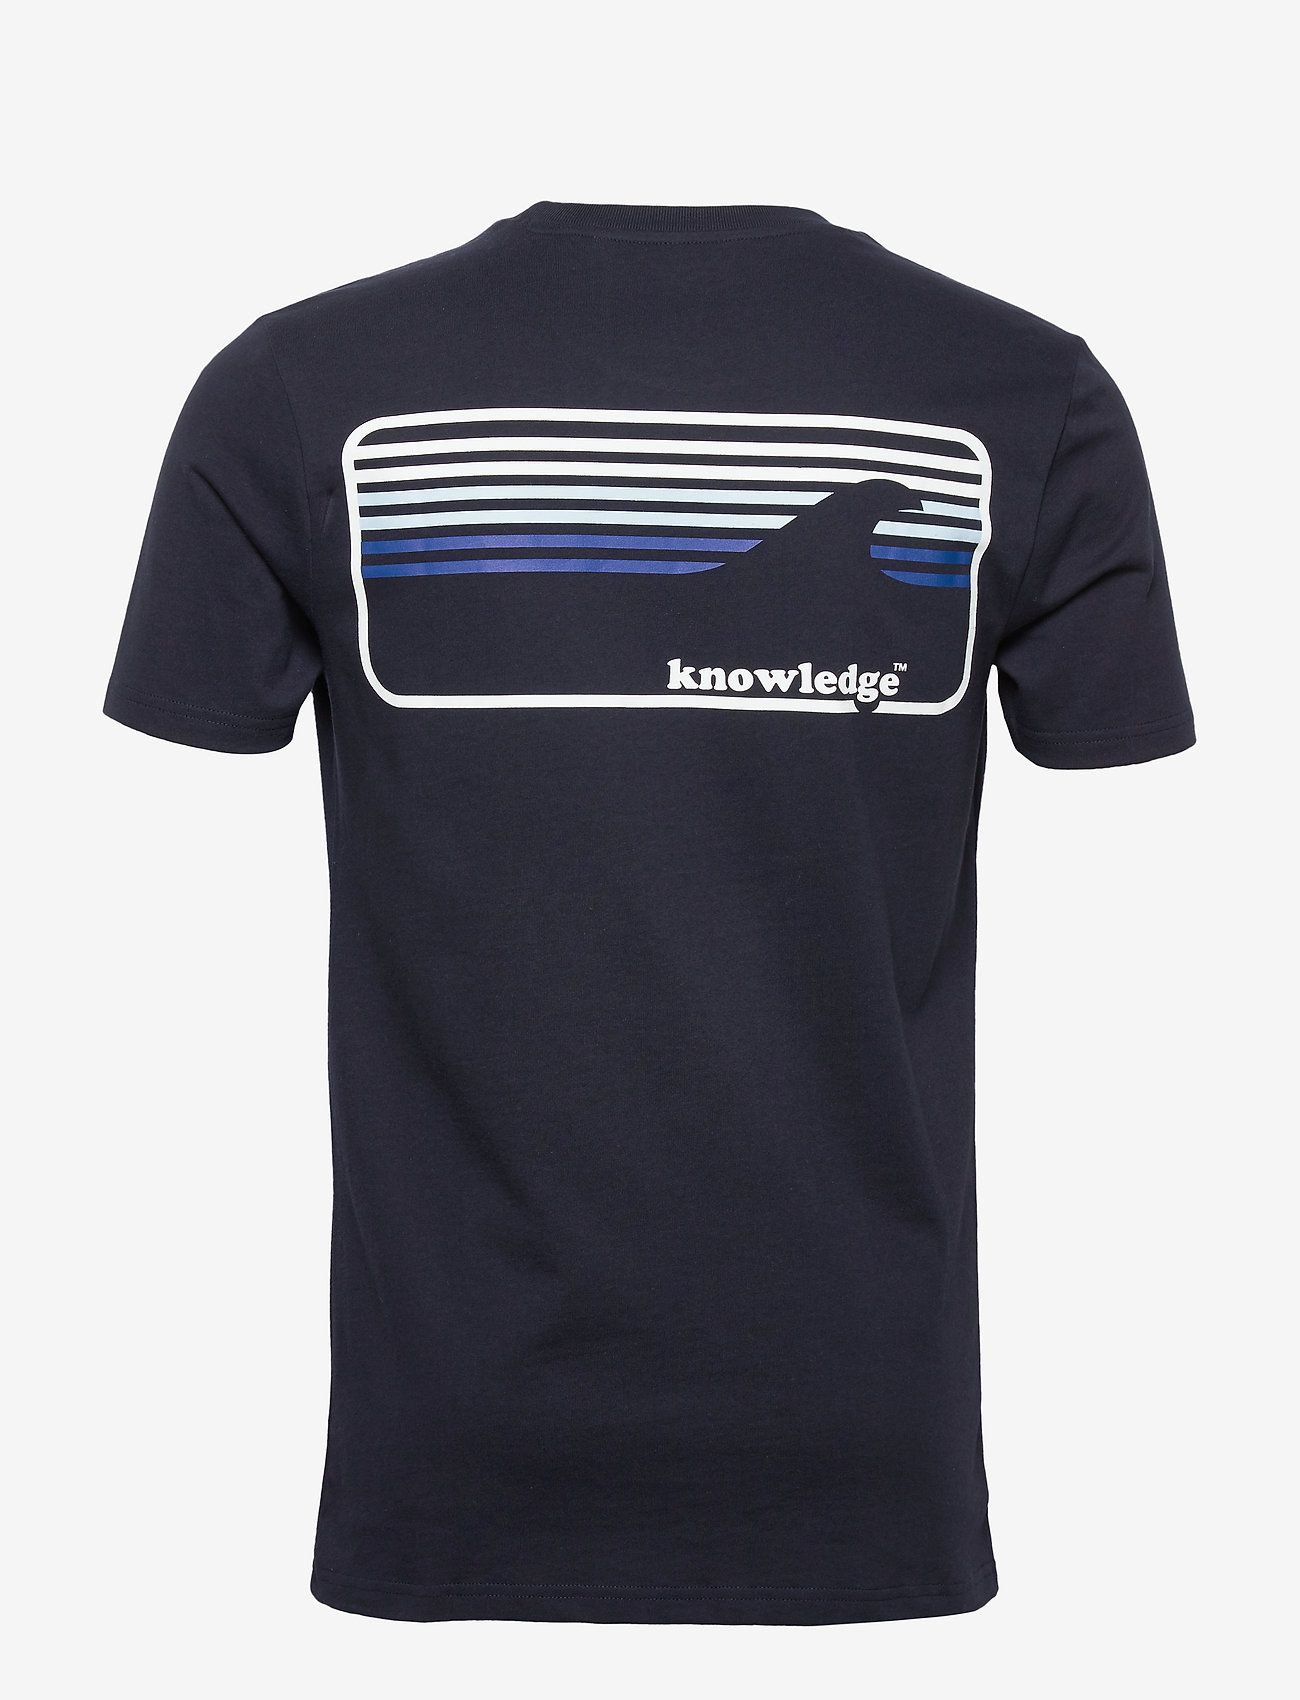 Knowledge Cotton Apparel ALDER knowledge tee - GOTS/Vegan - T-skjorter TOTAL ECLIPSE - Menn Klær